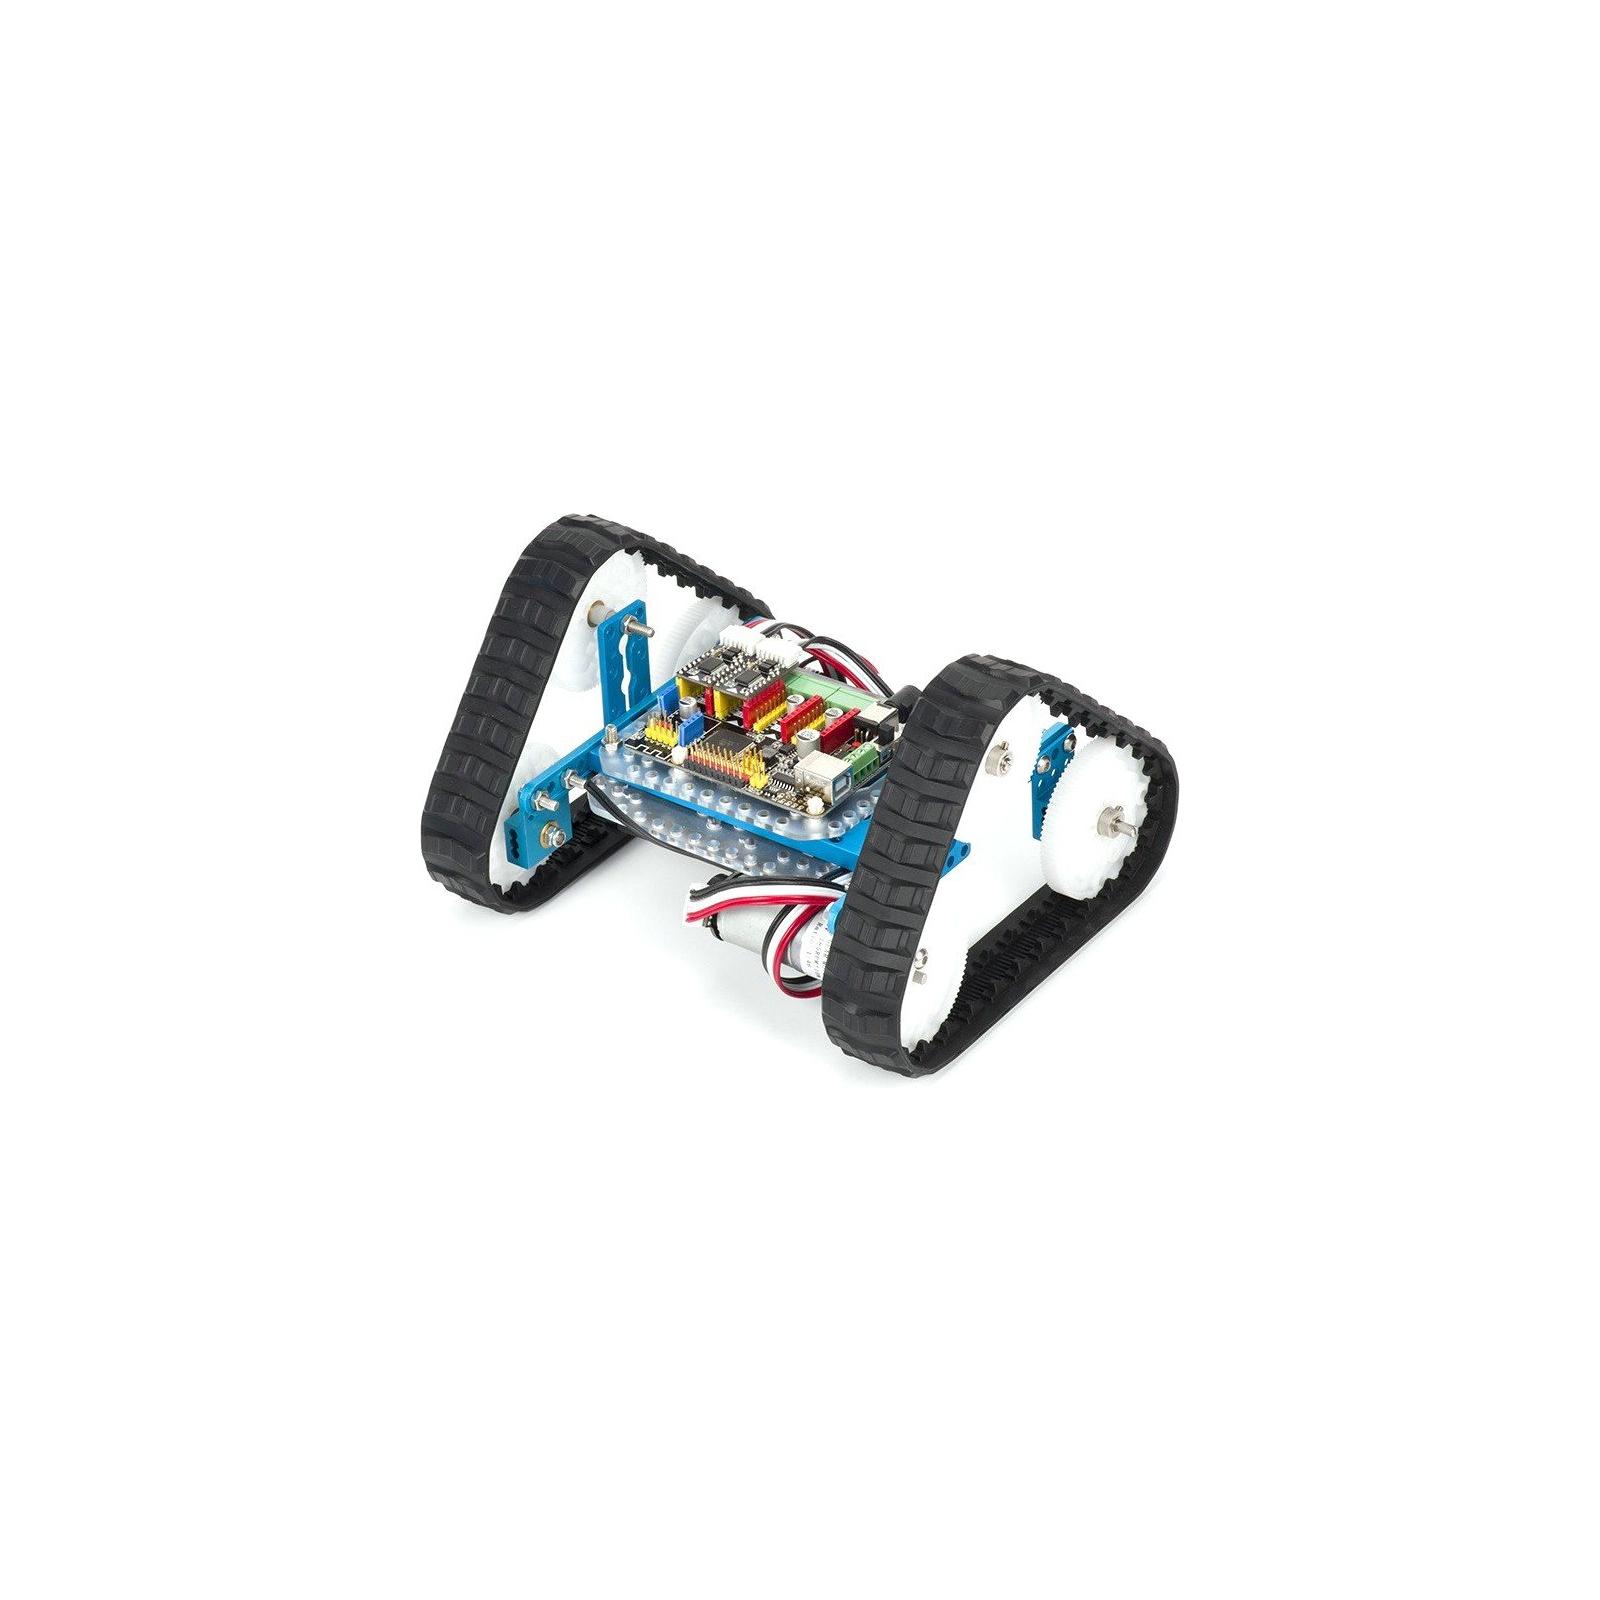 Робот Makeblock Ultimate v2.0 Robot Kit (09.00.40) изображение 4